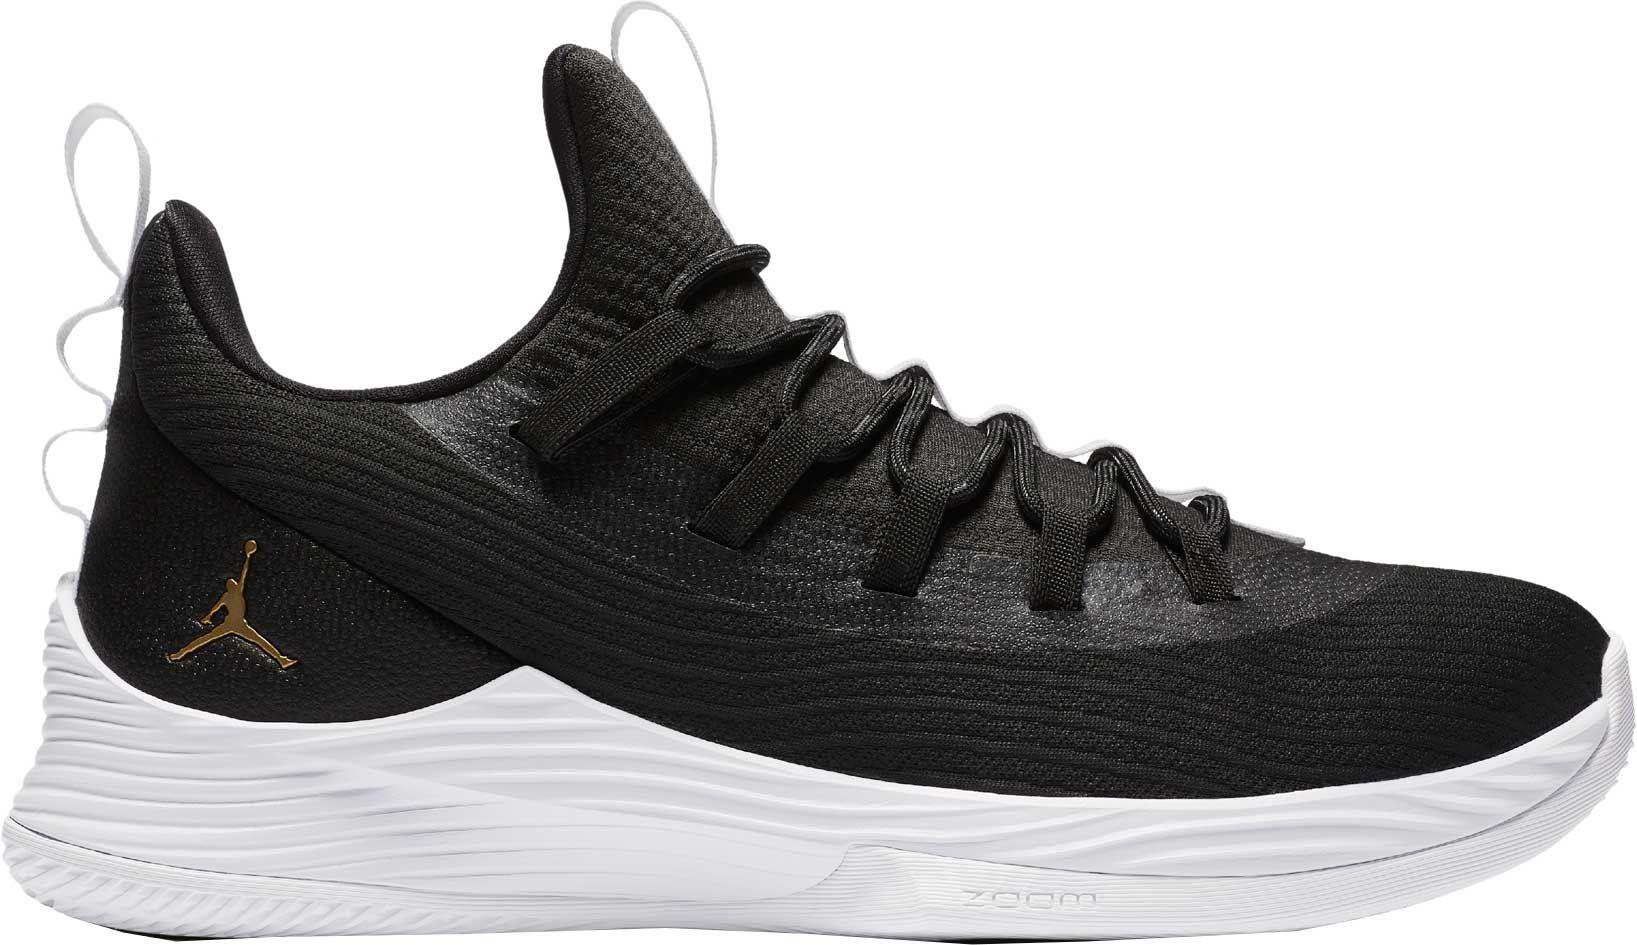 Jordan Ultra Fly 2 Low Men S Basketball Shoes Review Jordan Basketball Shoes Basketball Shoes Shoes